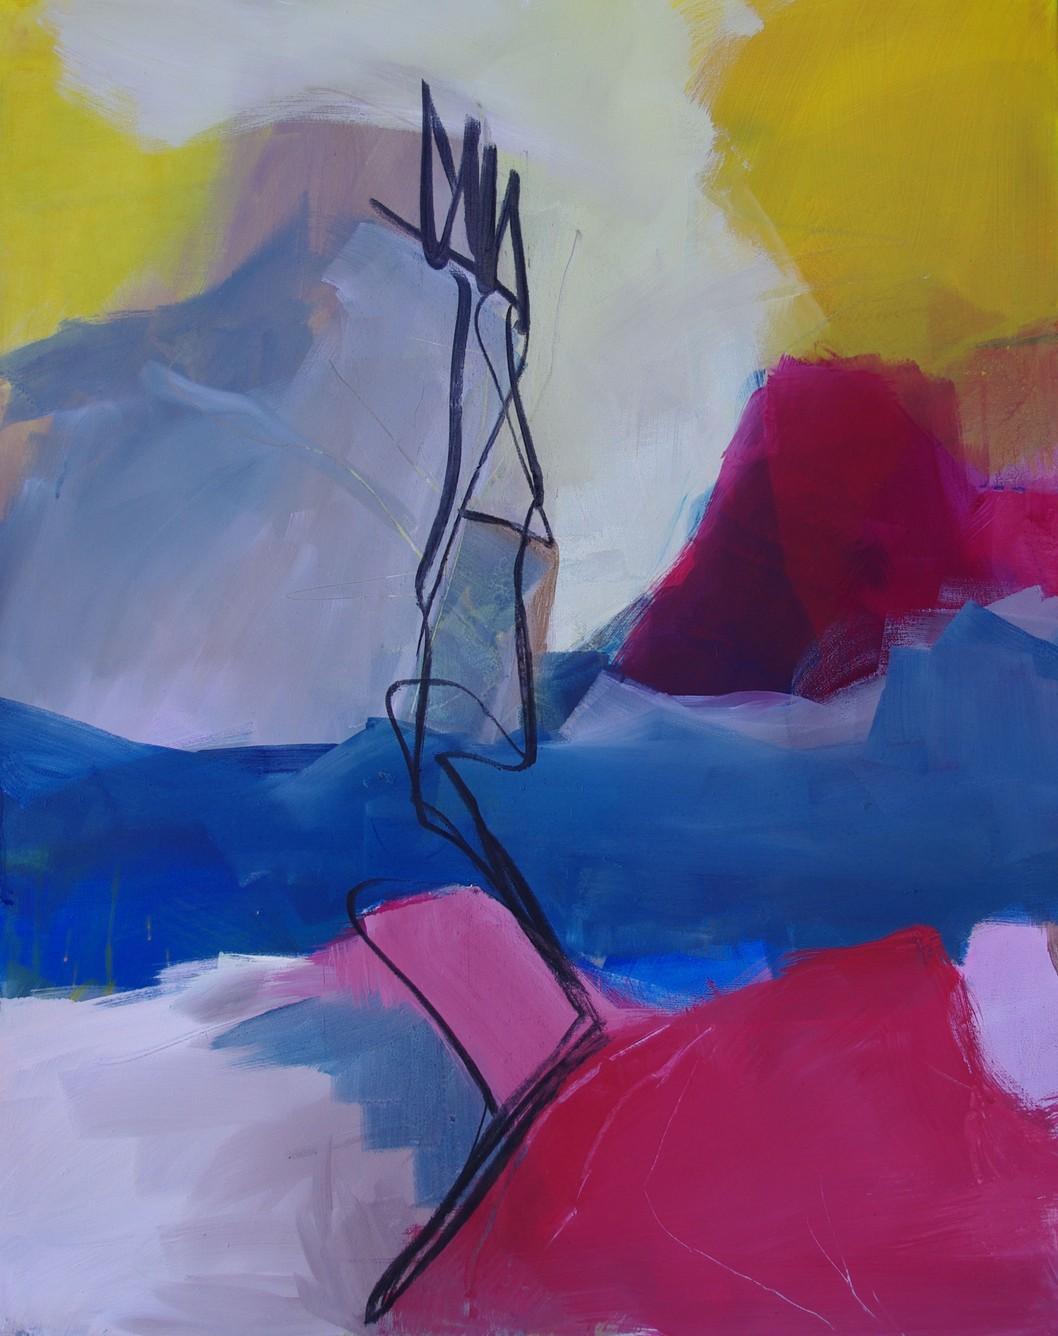 Serie Cote Rose, Die Nebel Phrase, Pigment, 2018, 100x80cm